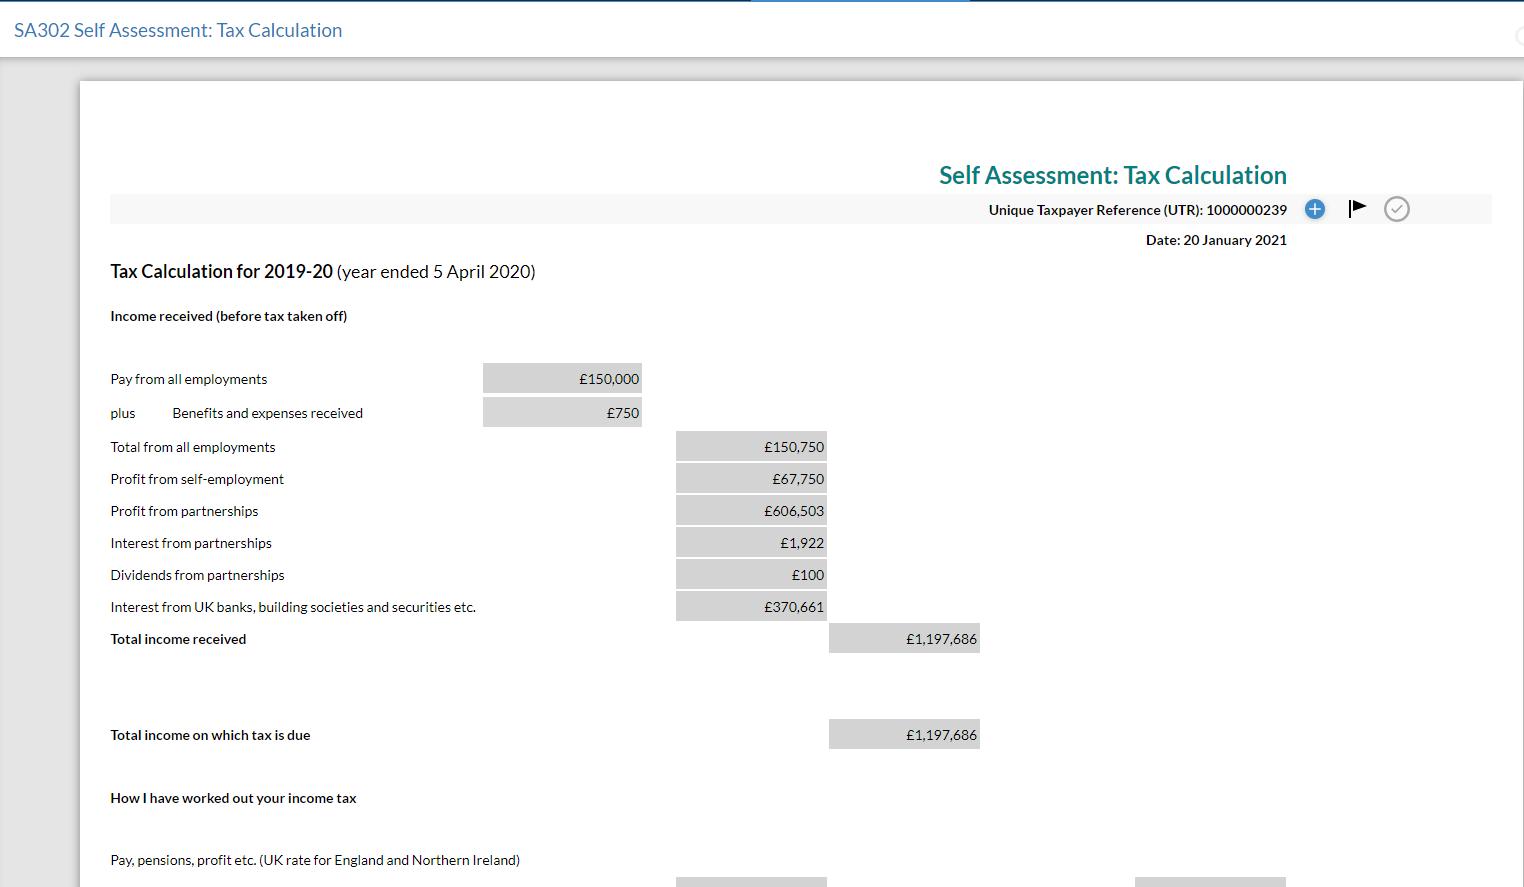 sa302-tax-calculation